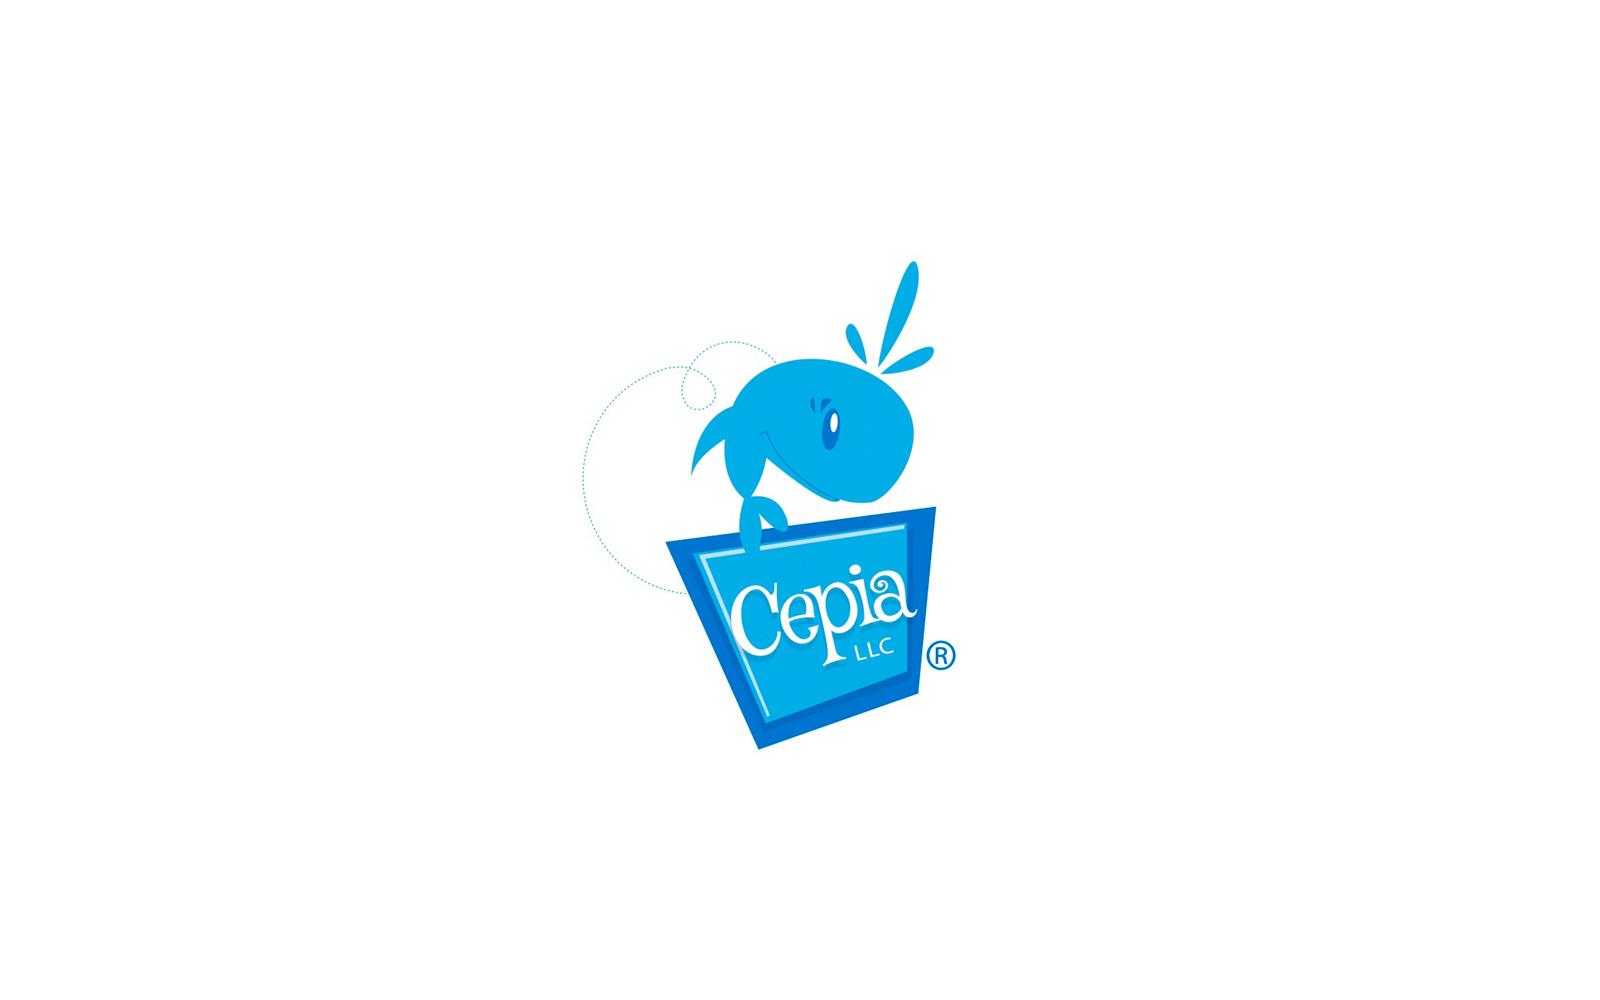 Cepia LLC